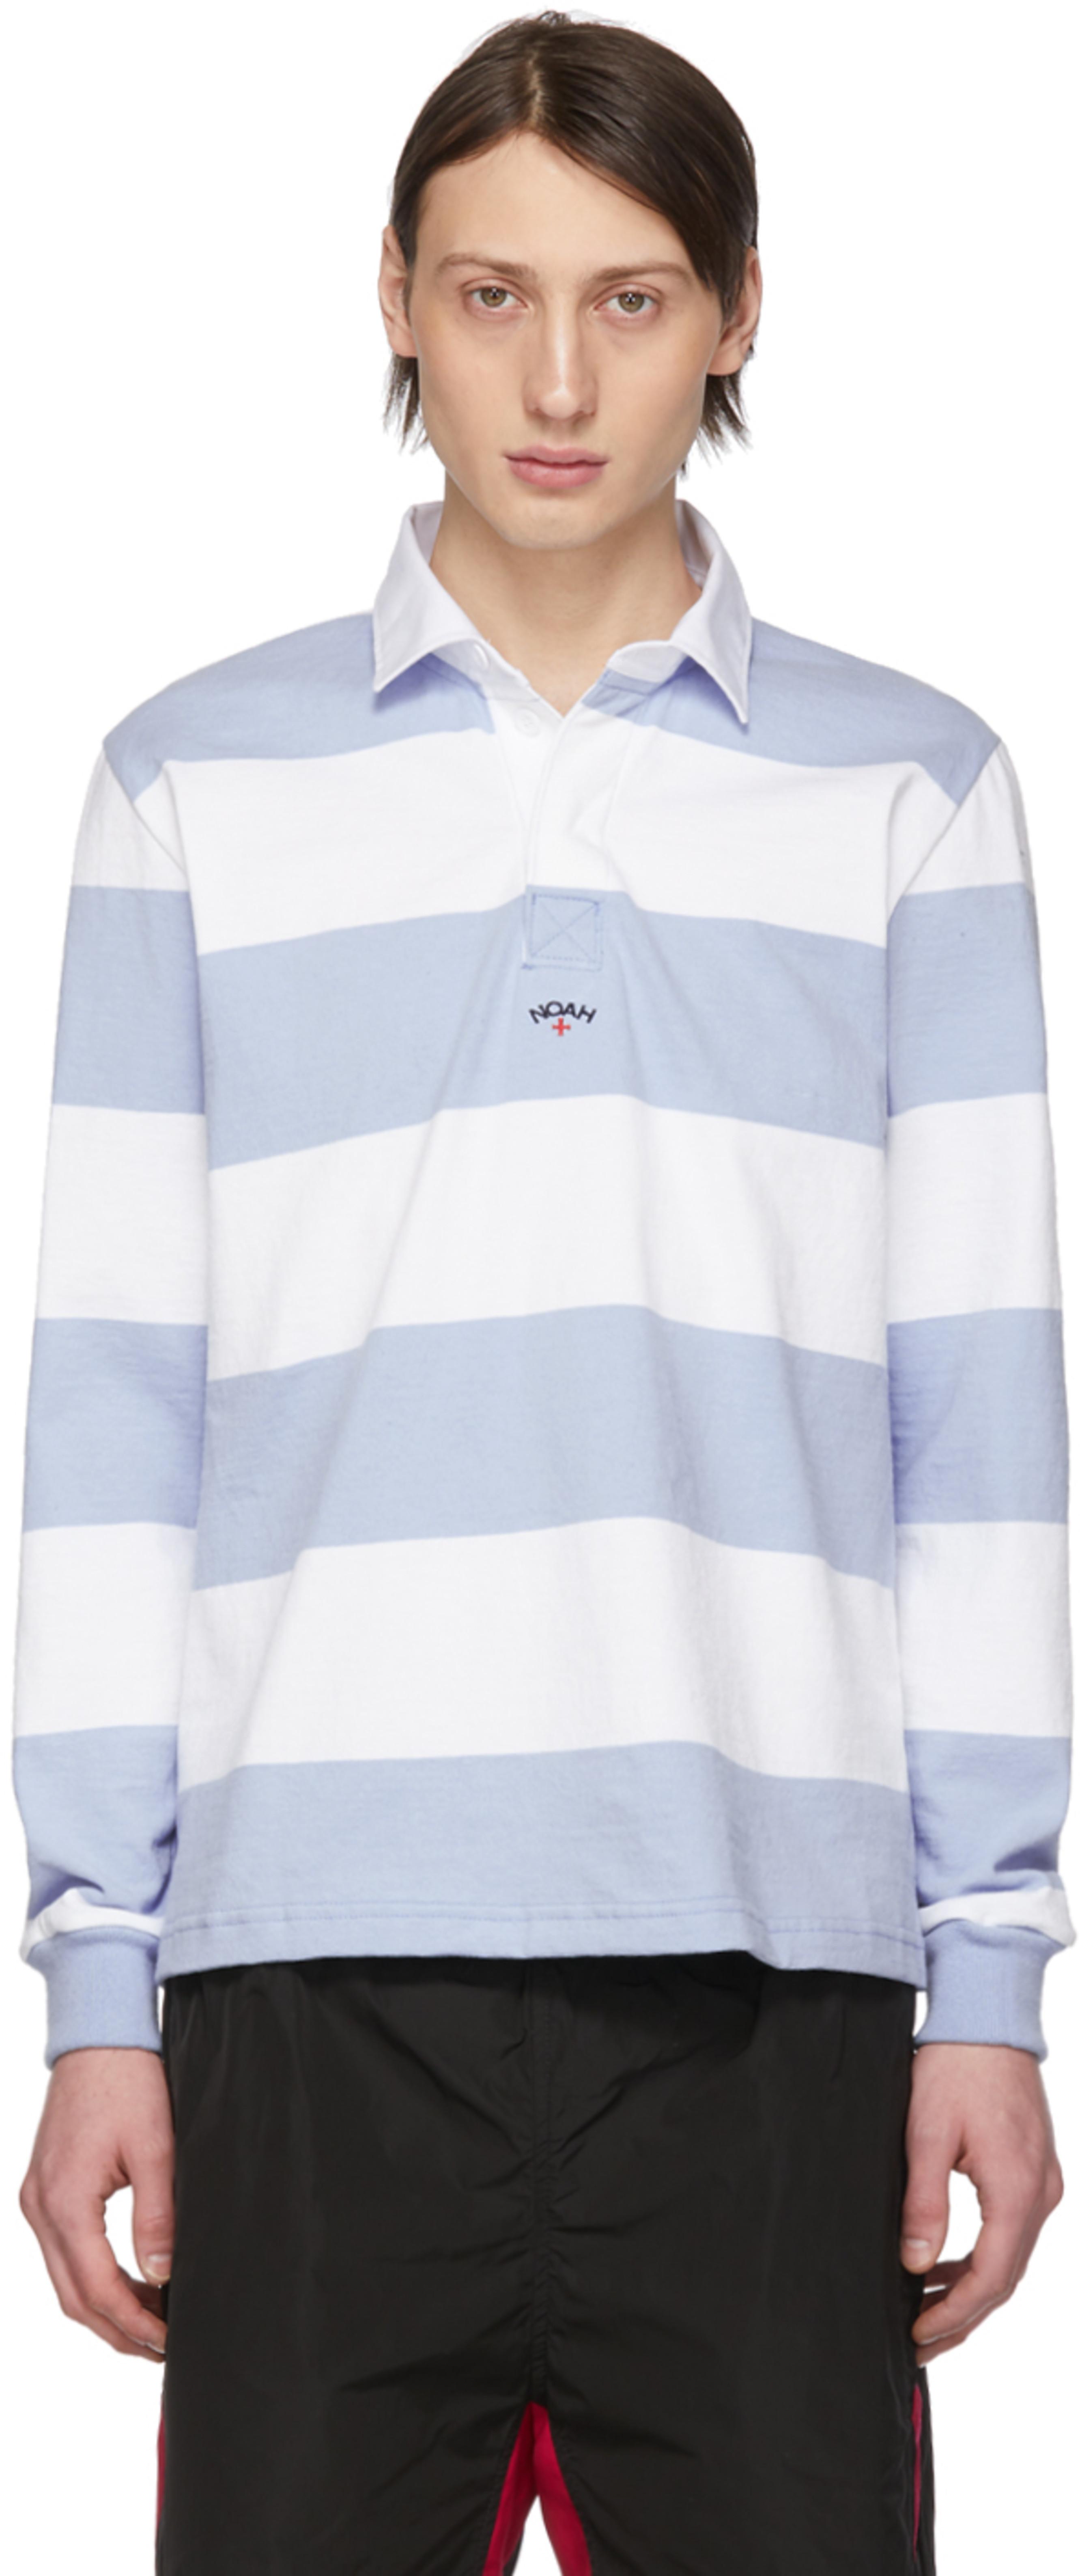 a64b93a04 Noah Nyc clothing for Men   SSENSE UK